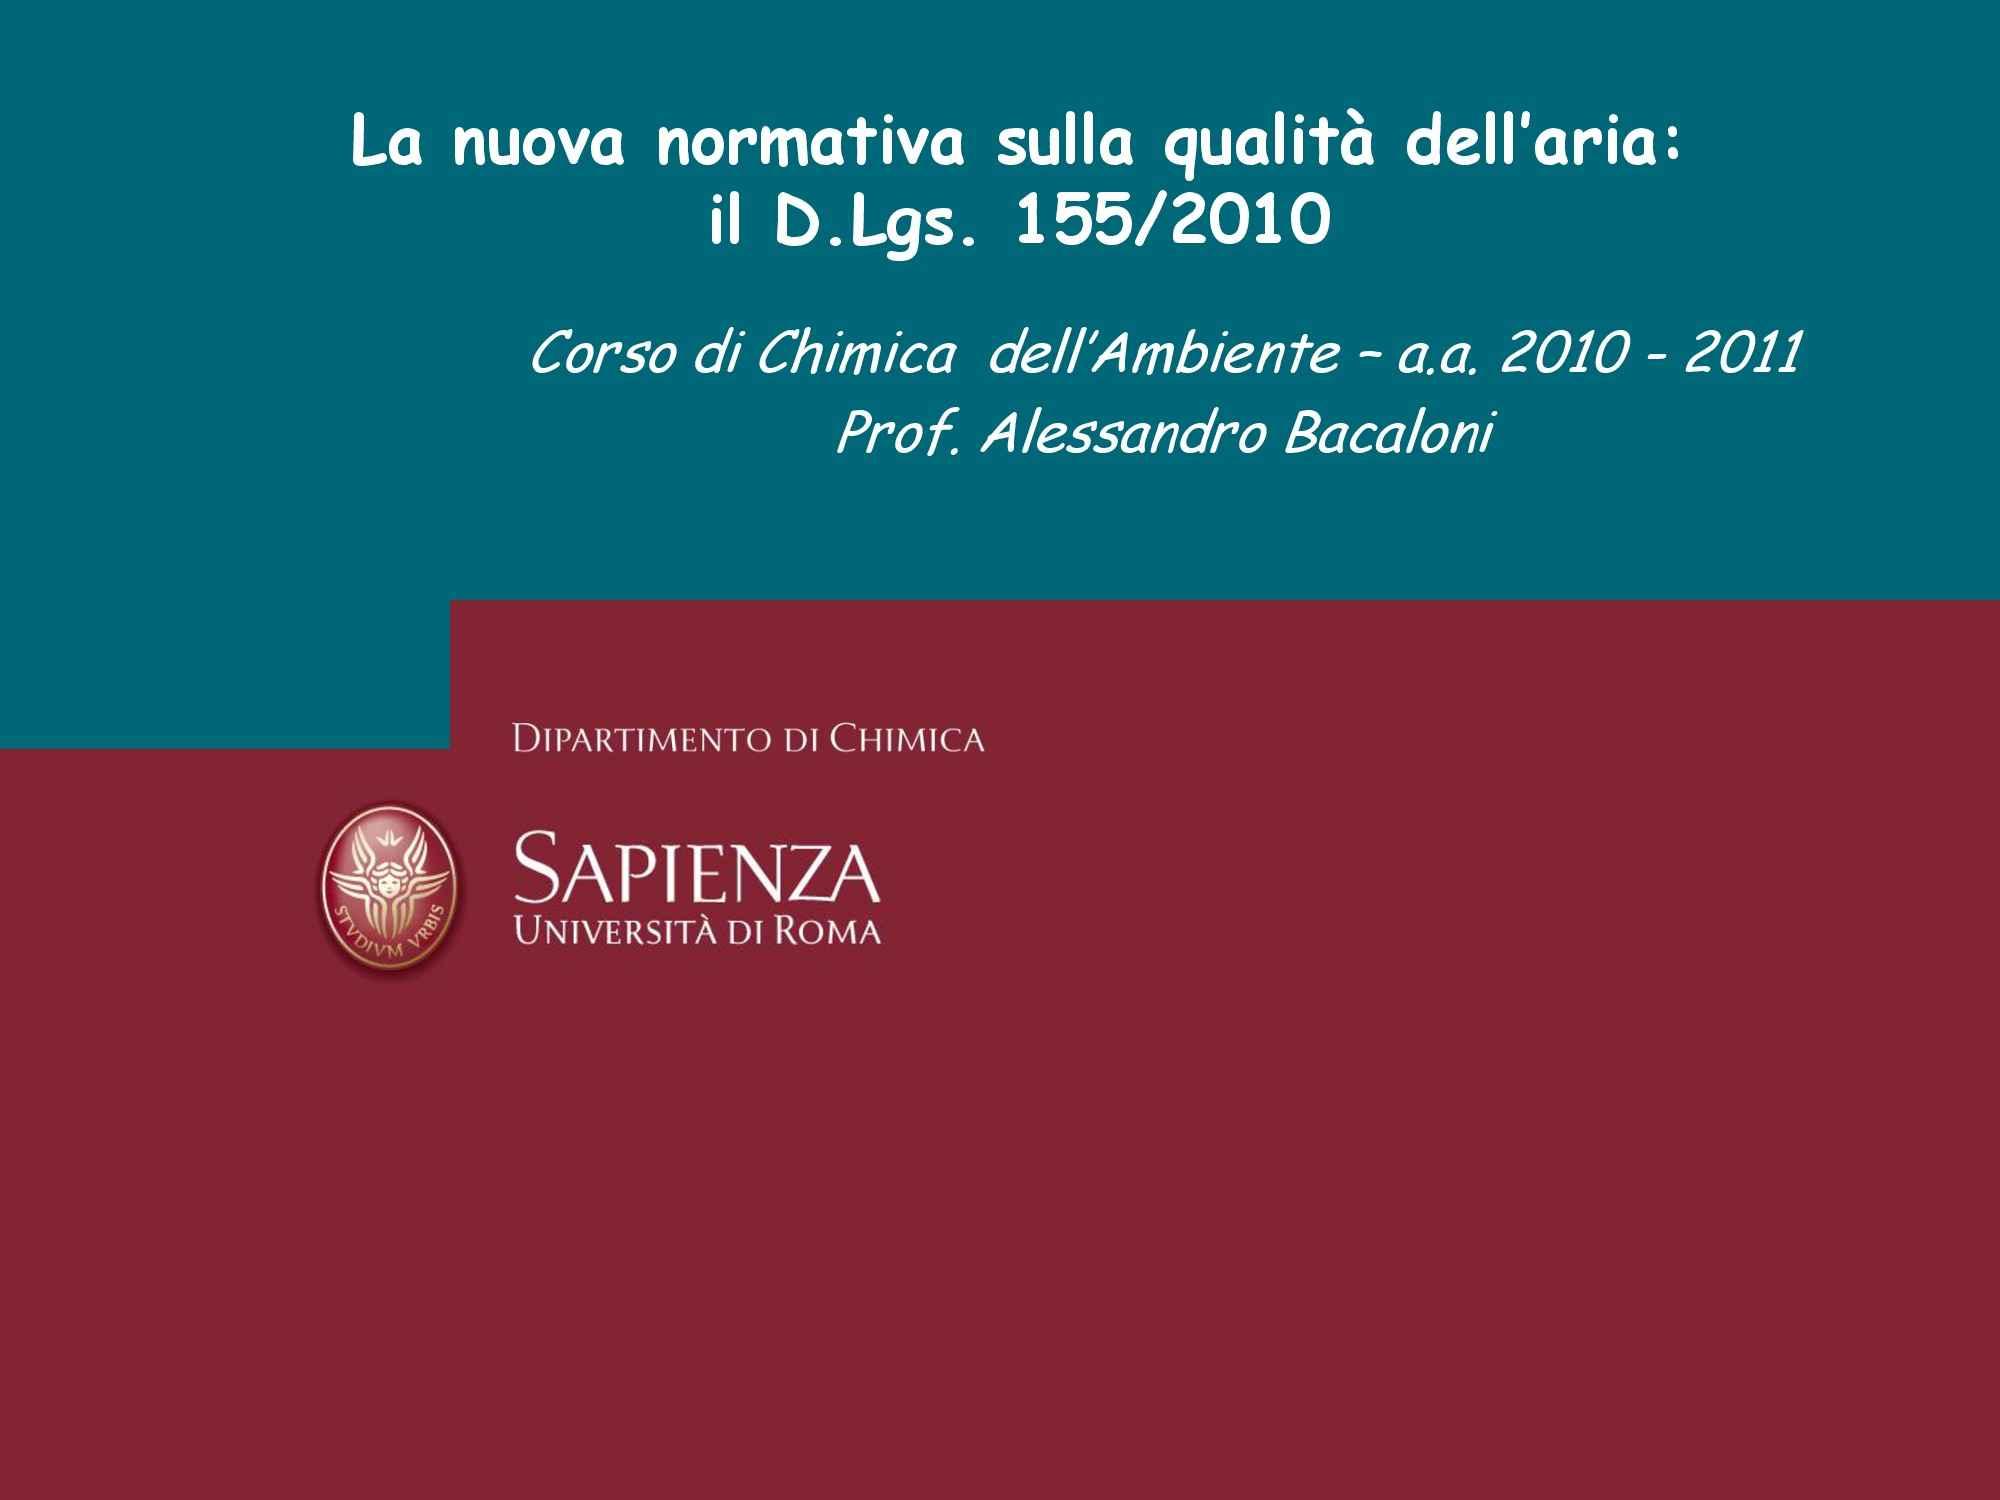 Analisi del D. Lgs. 155/2010